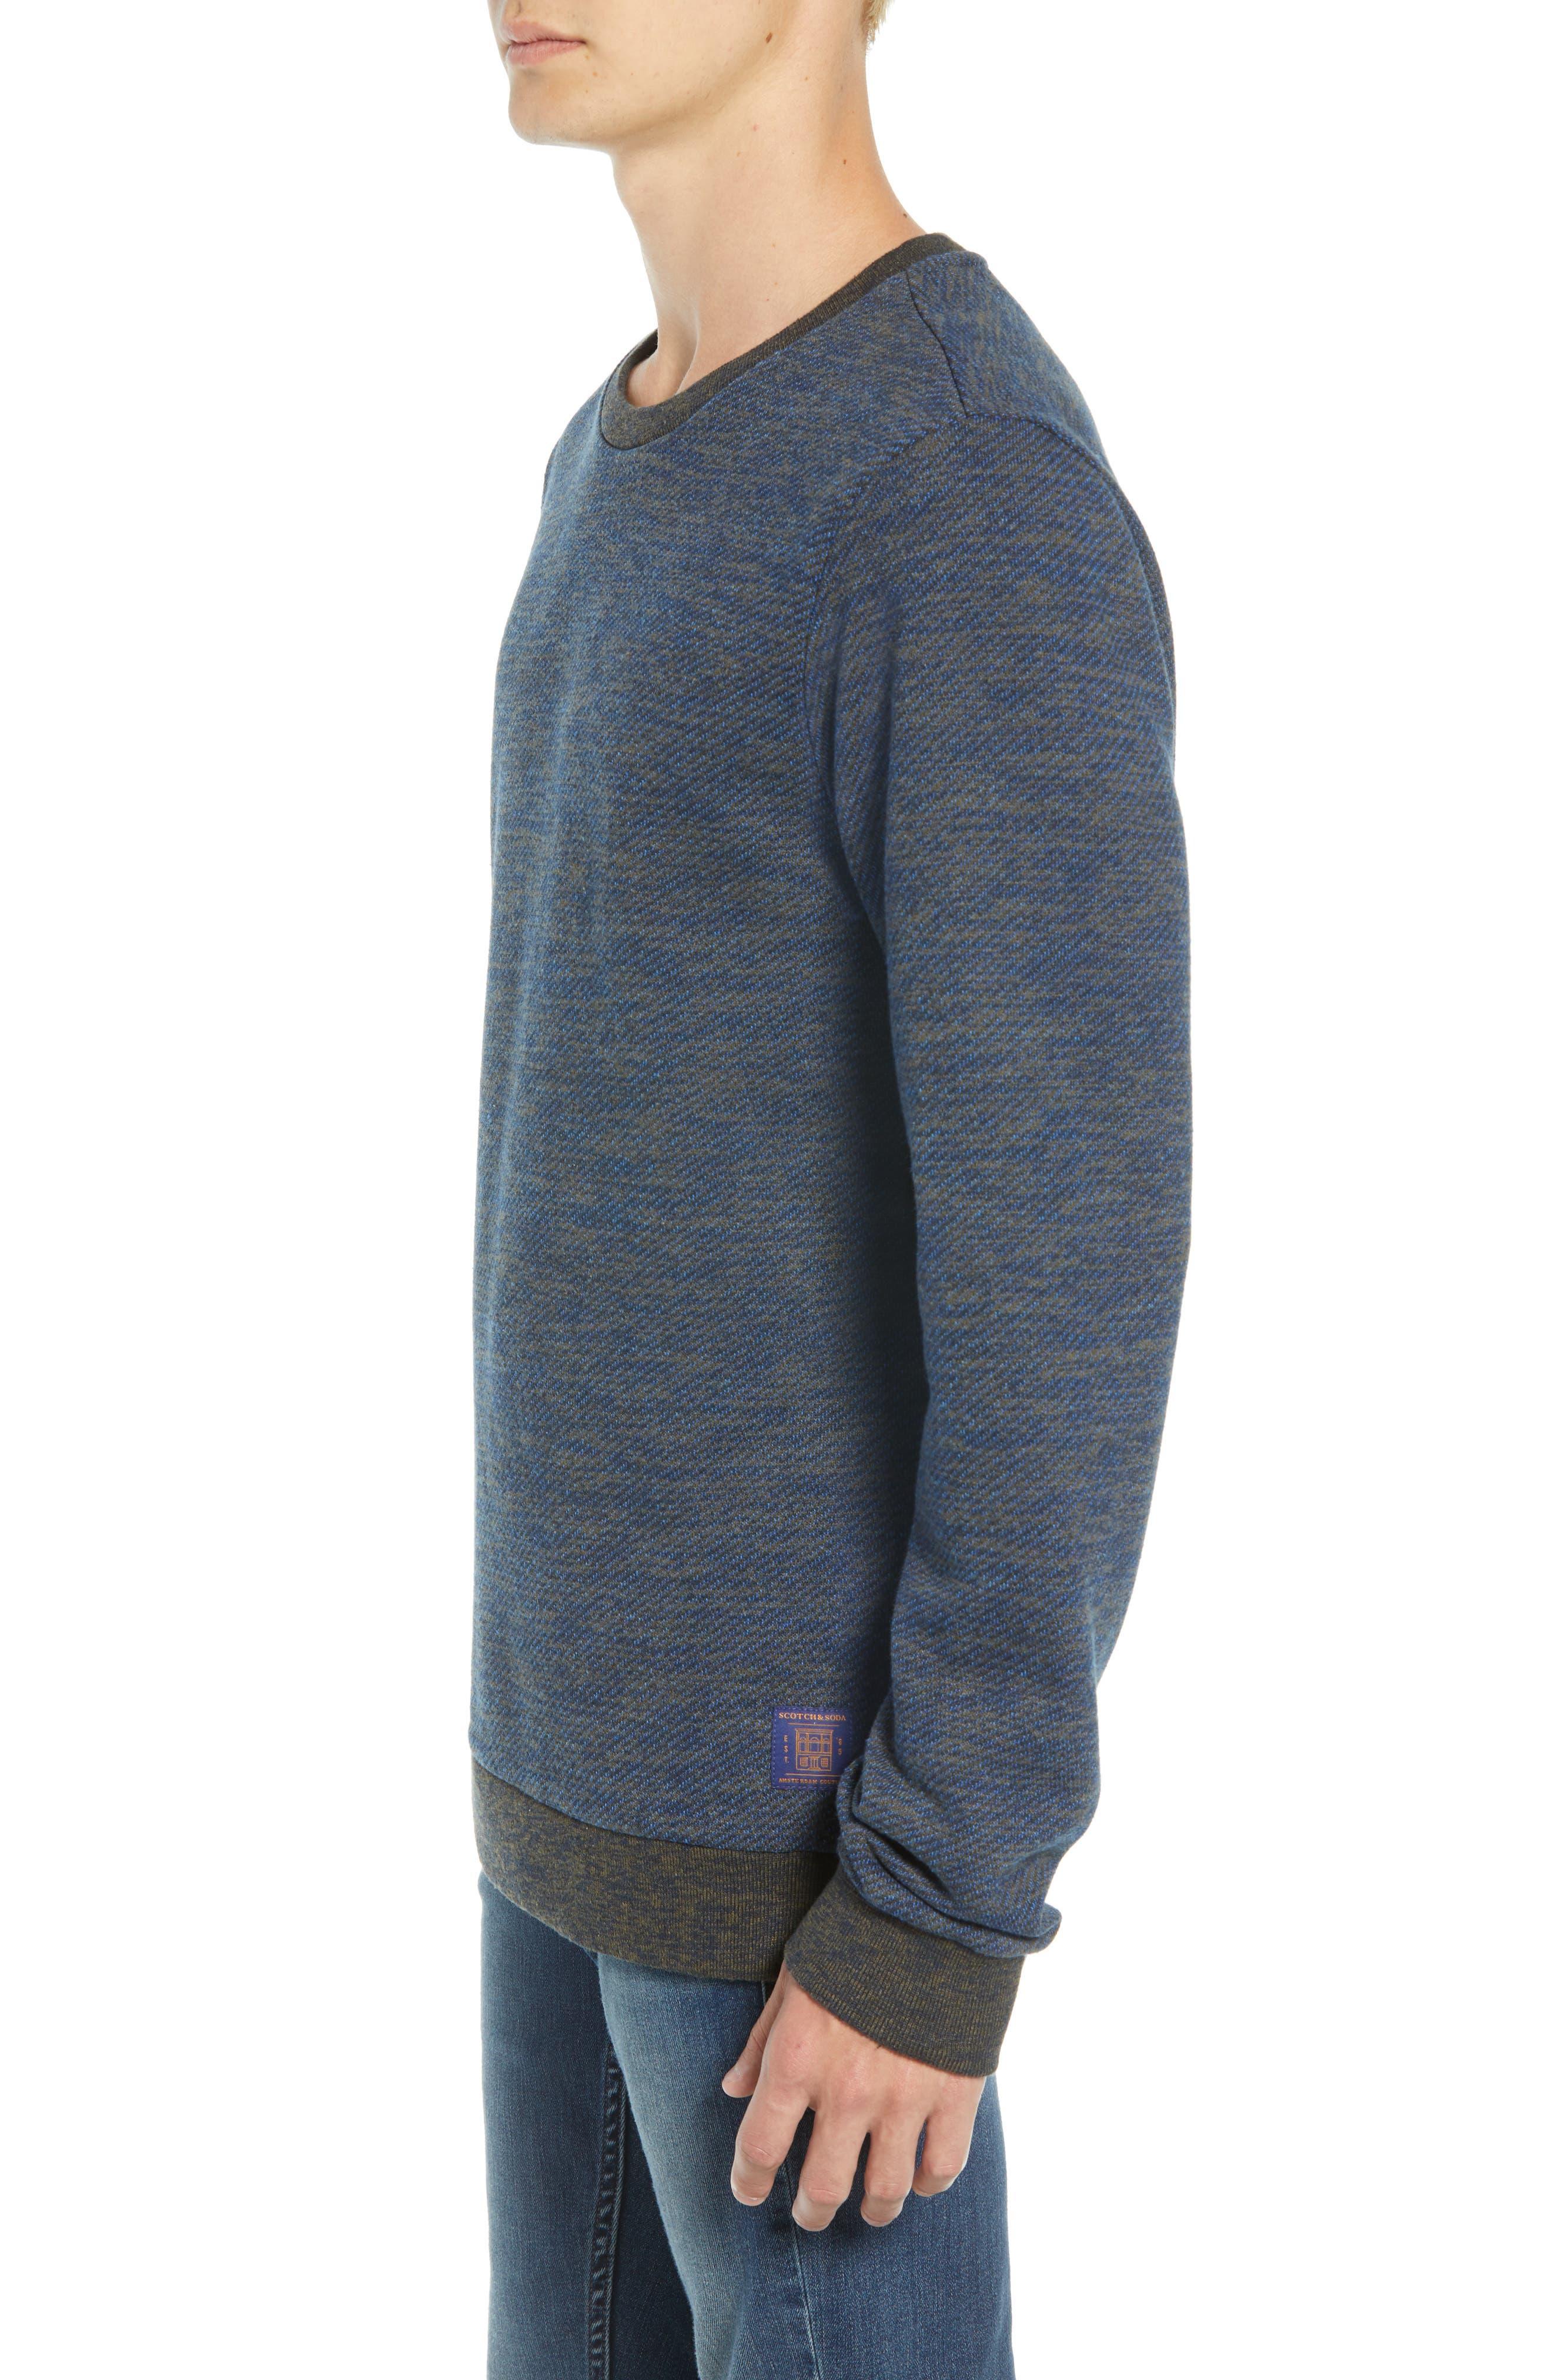 SCOTCH & SODA,                             Crewneck Sweatshirt,                             Alternate thumbnail 3, color,                             410